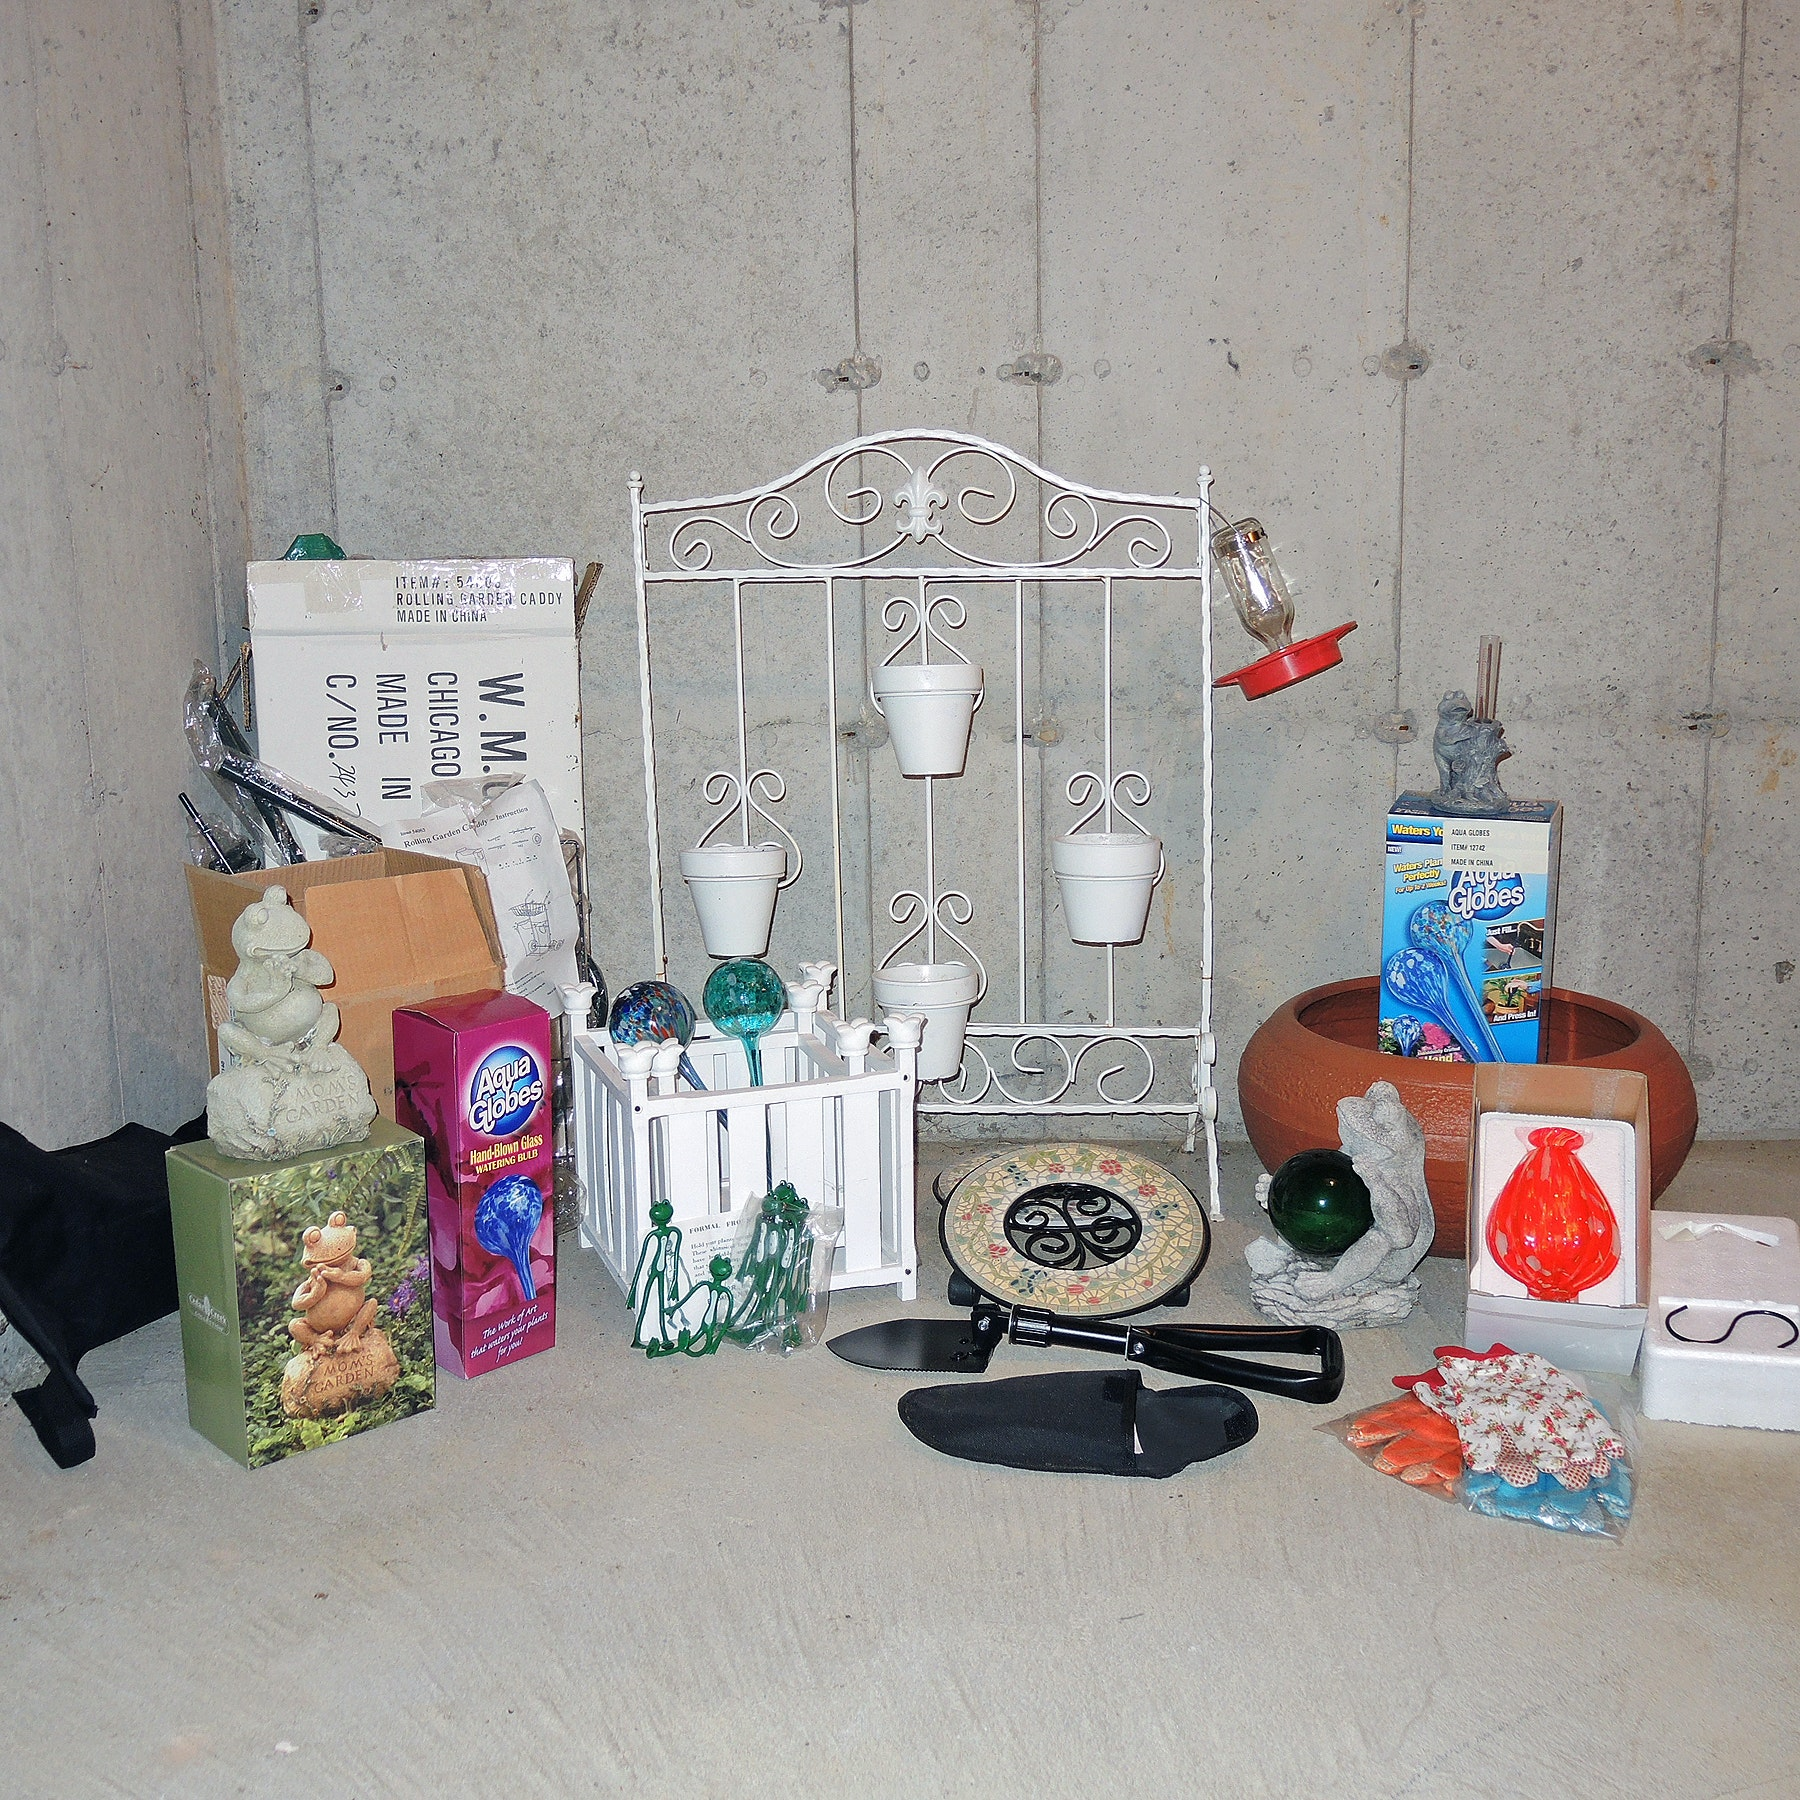 Lawn Ornaments, Garden Caddy, Hummingbird Feeders and Gardening Accessories